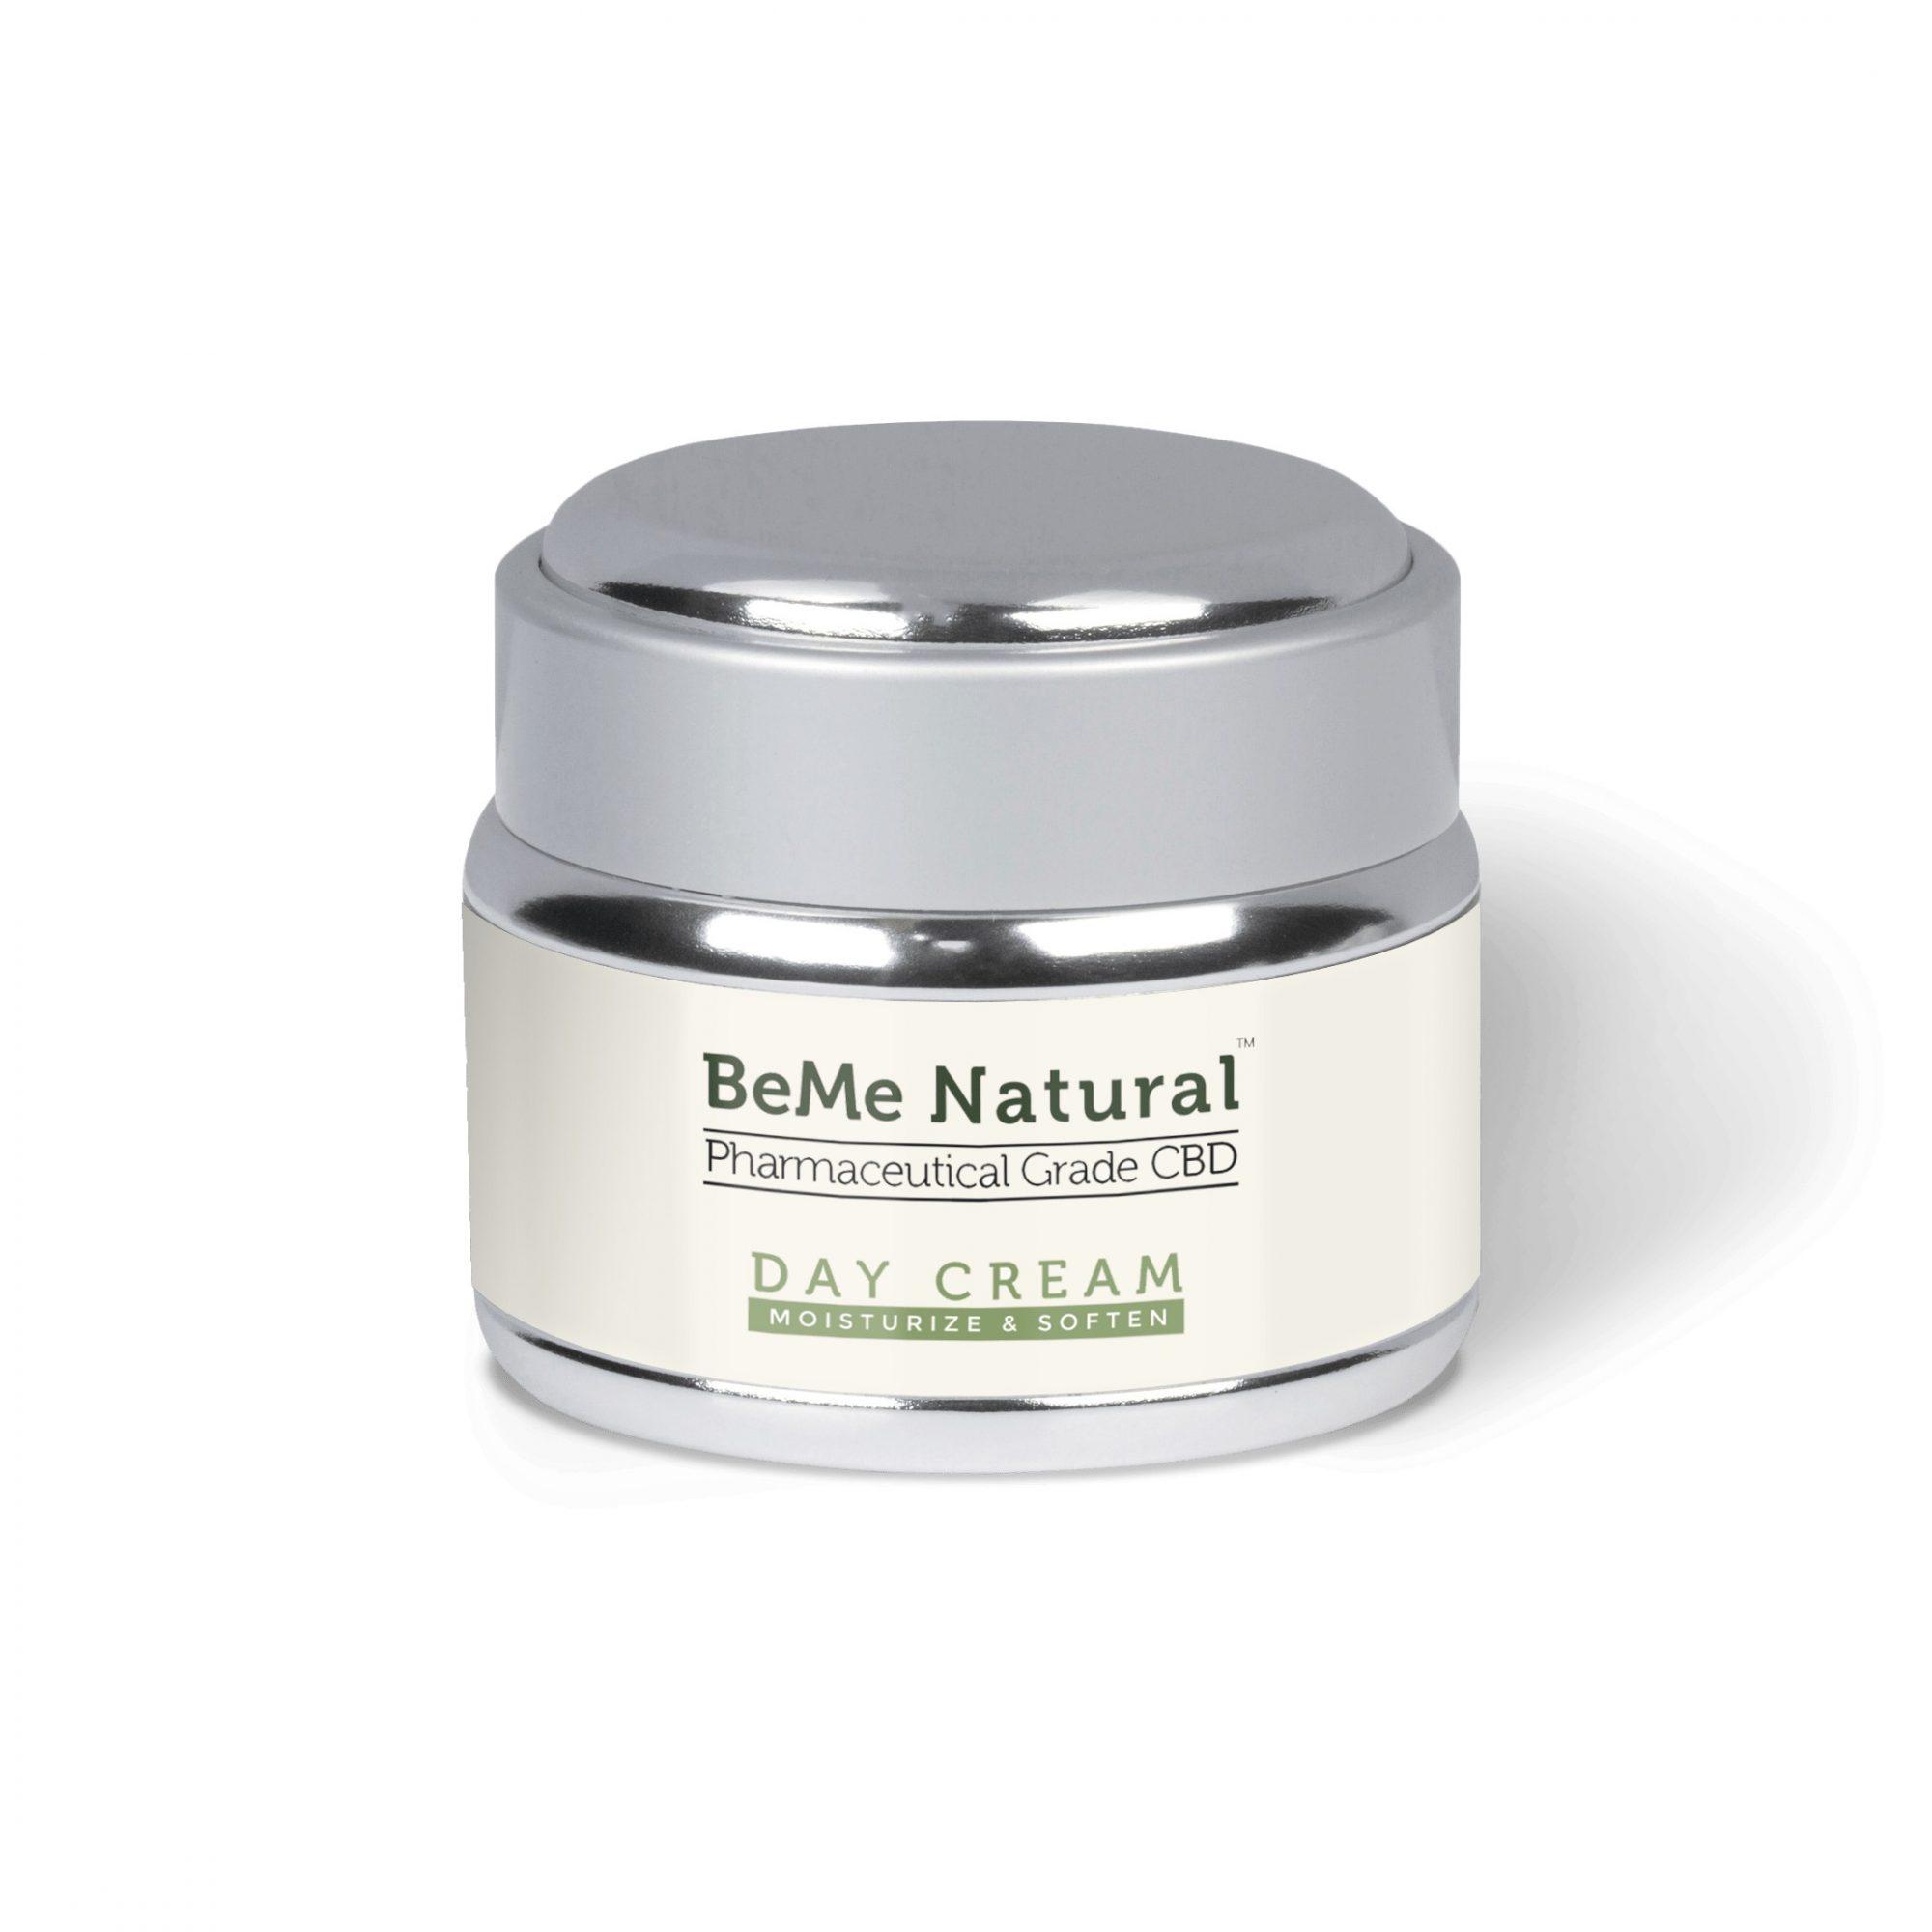 BeMeNatural Day Cream Rendering min - CBD Day Cream – 100mg